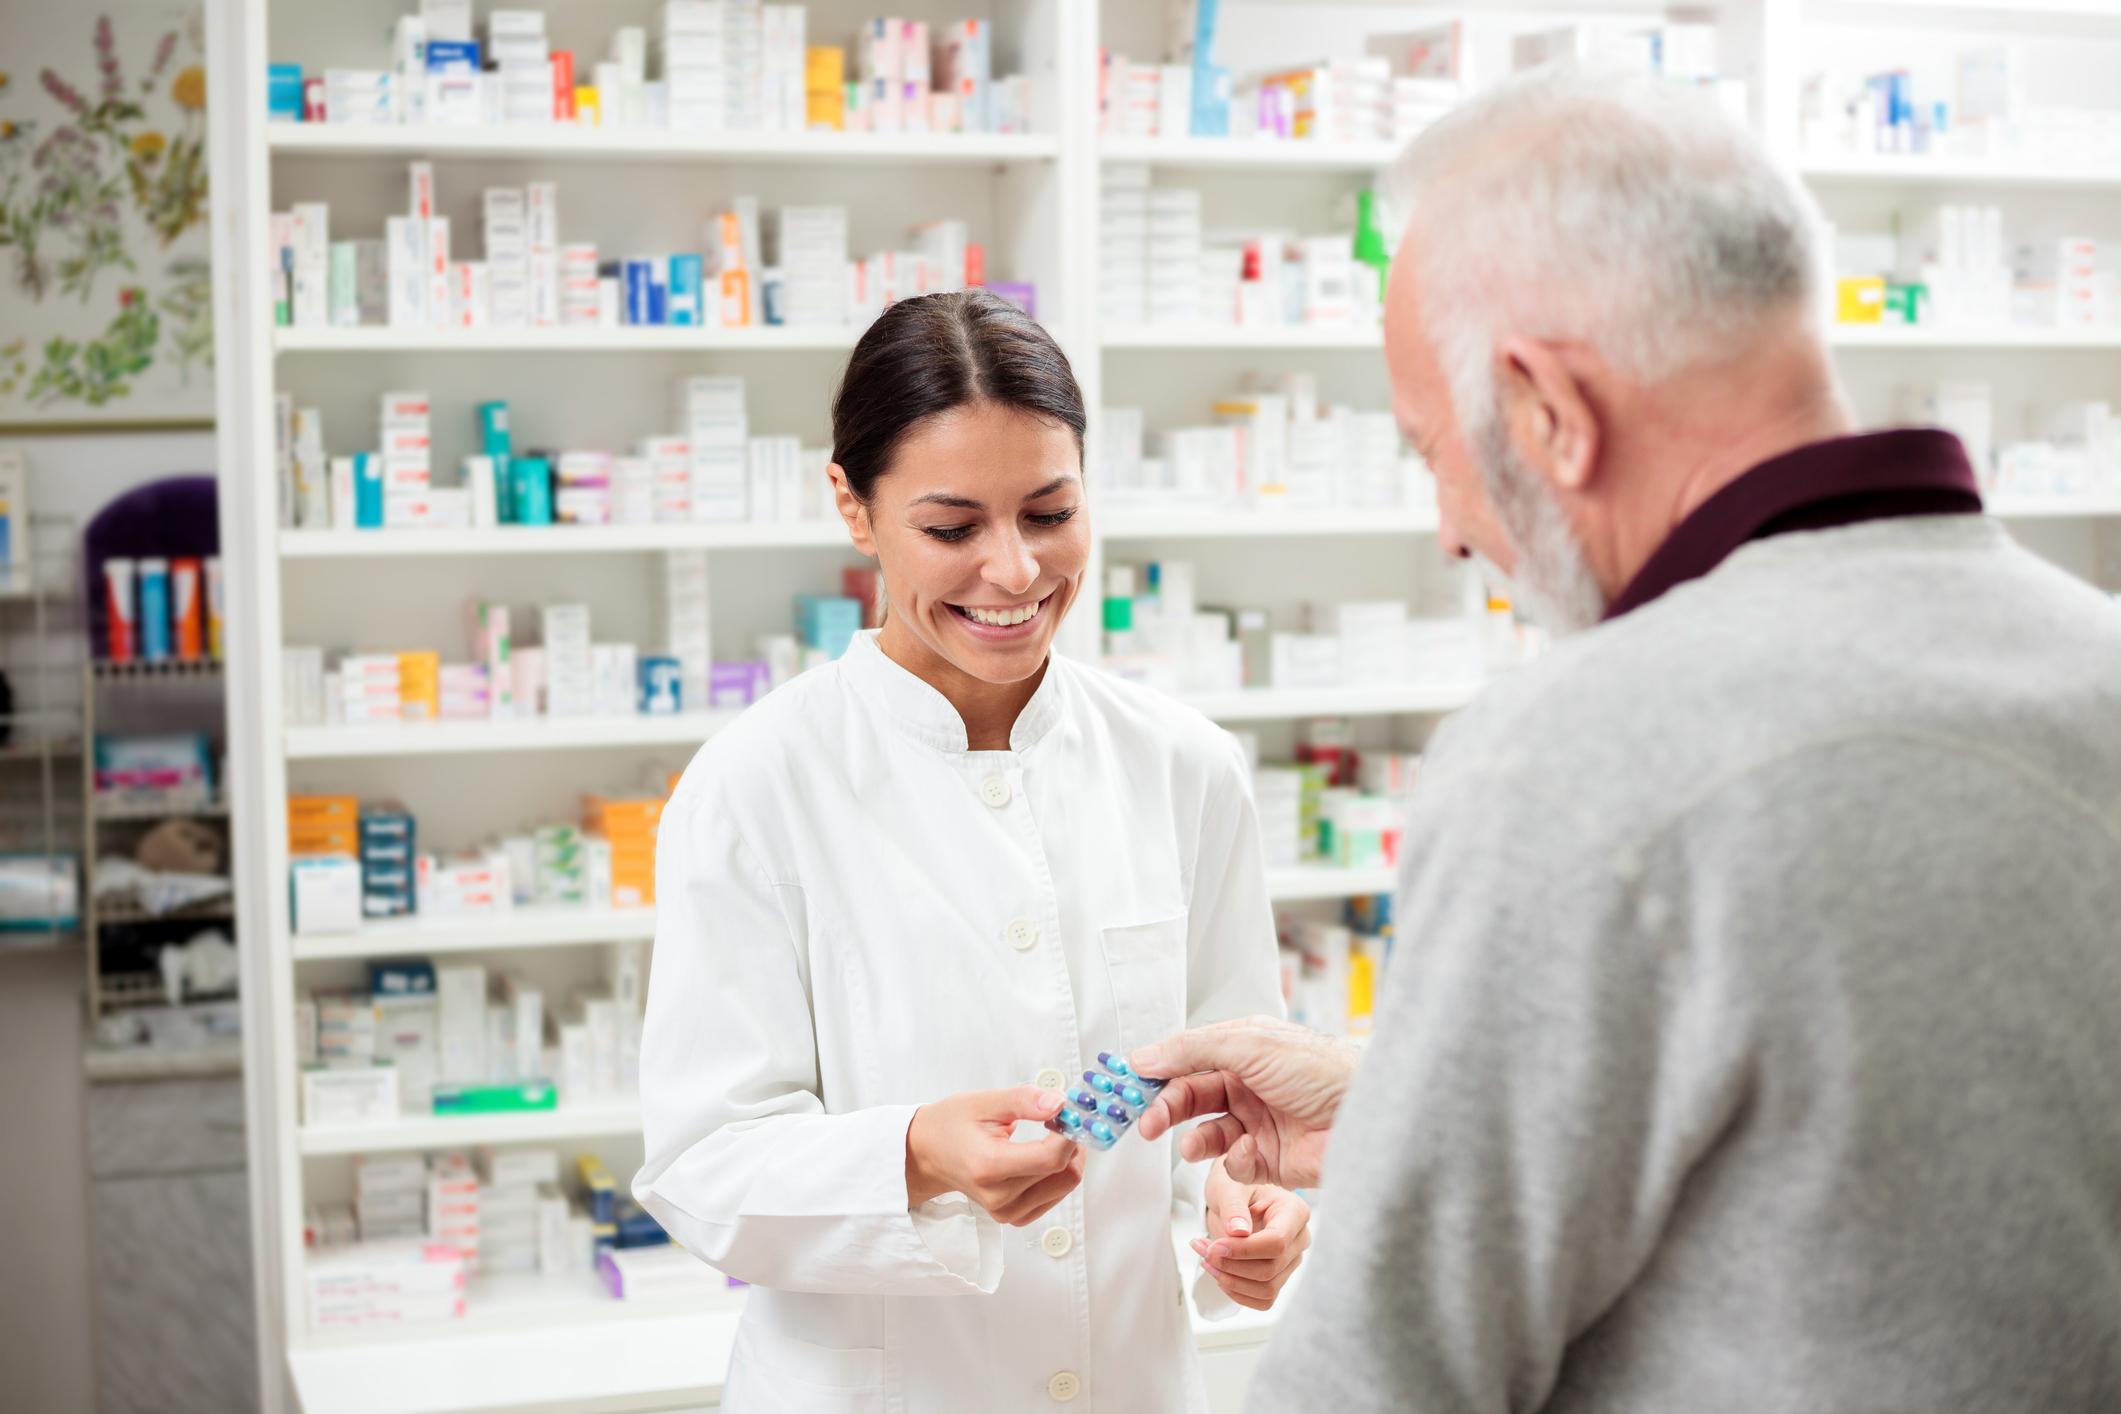 Pharmacist handing a man his medicine